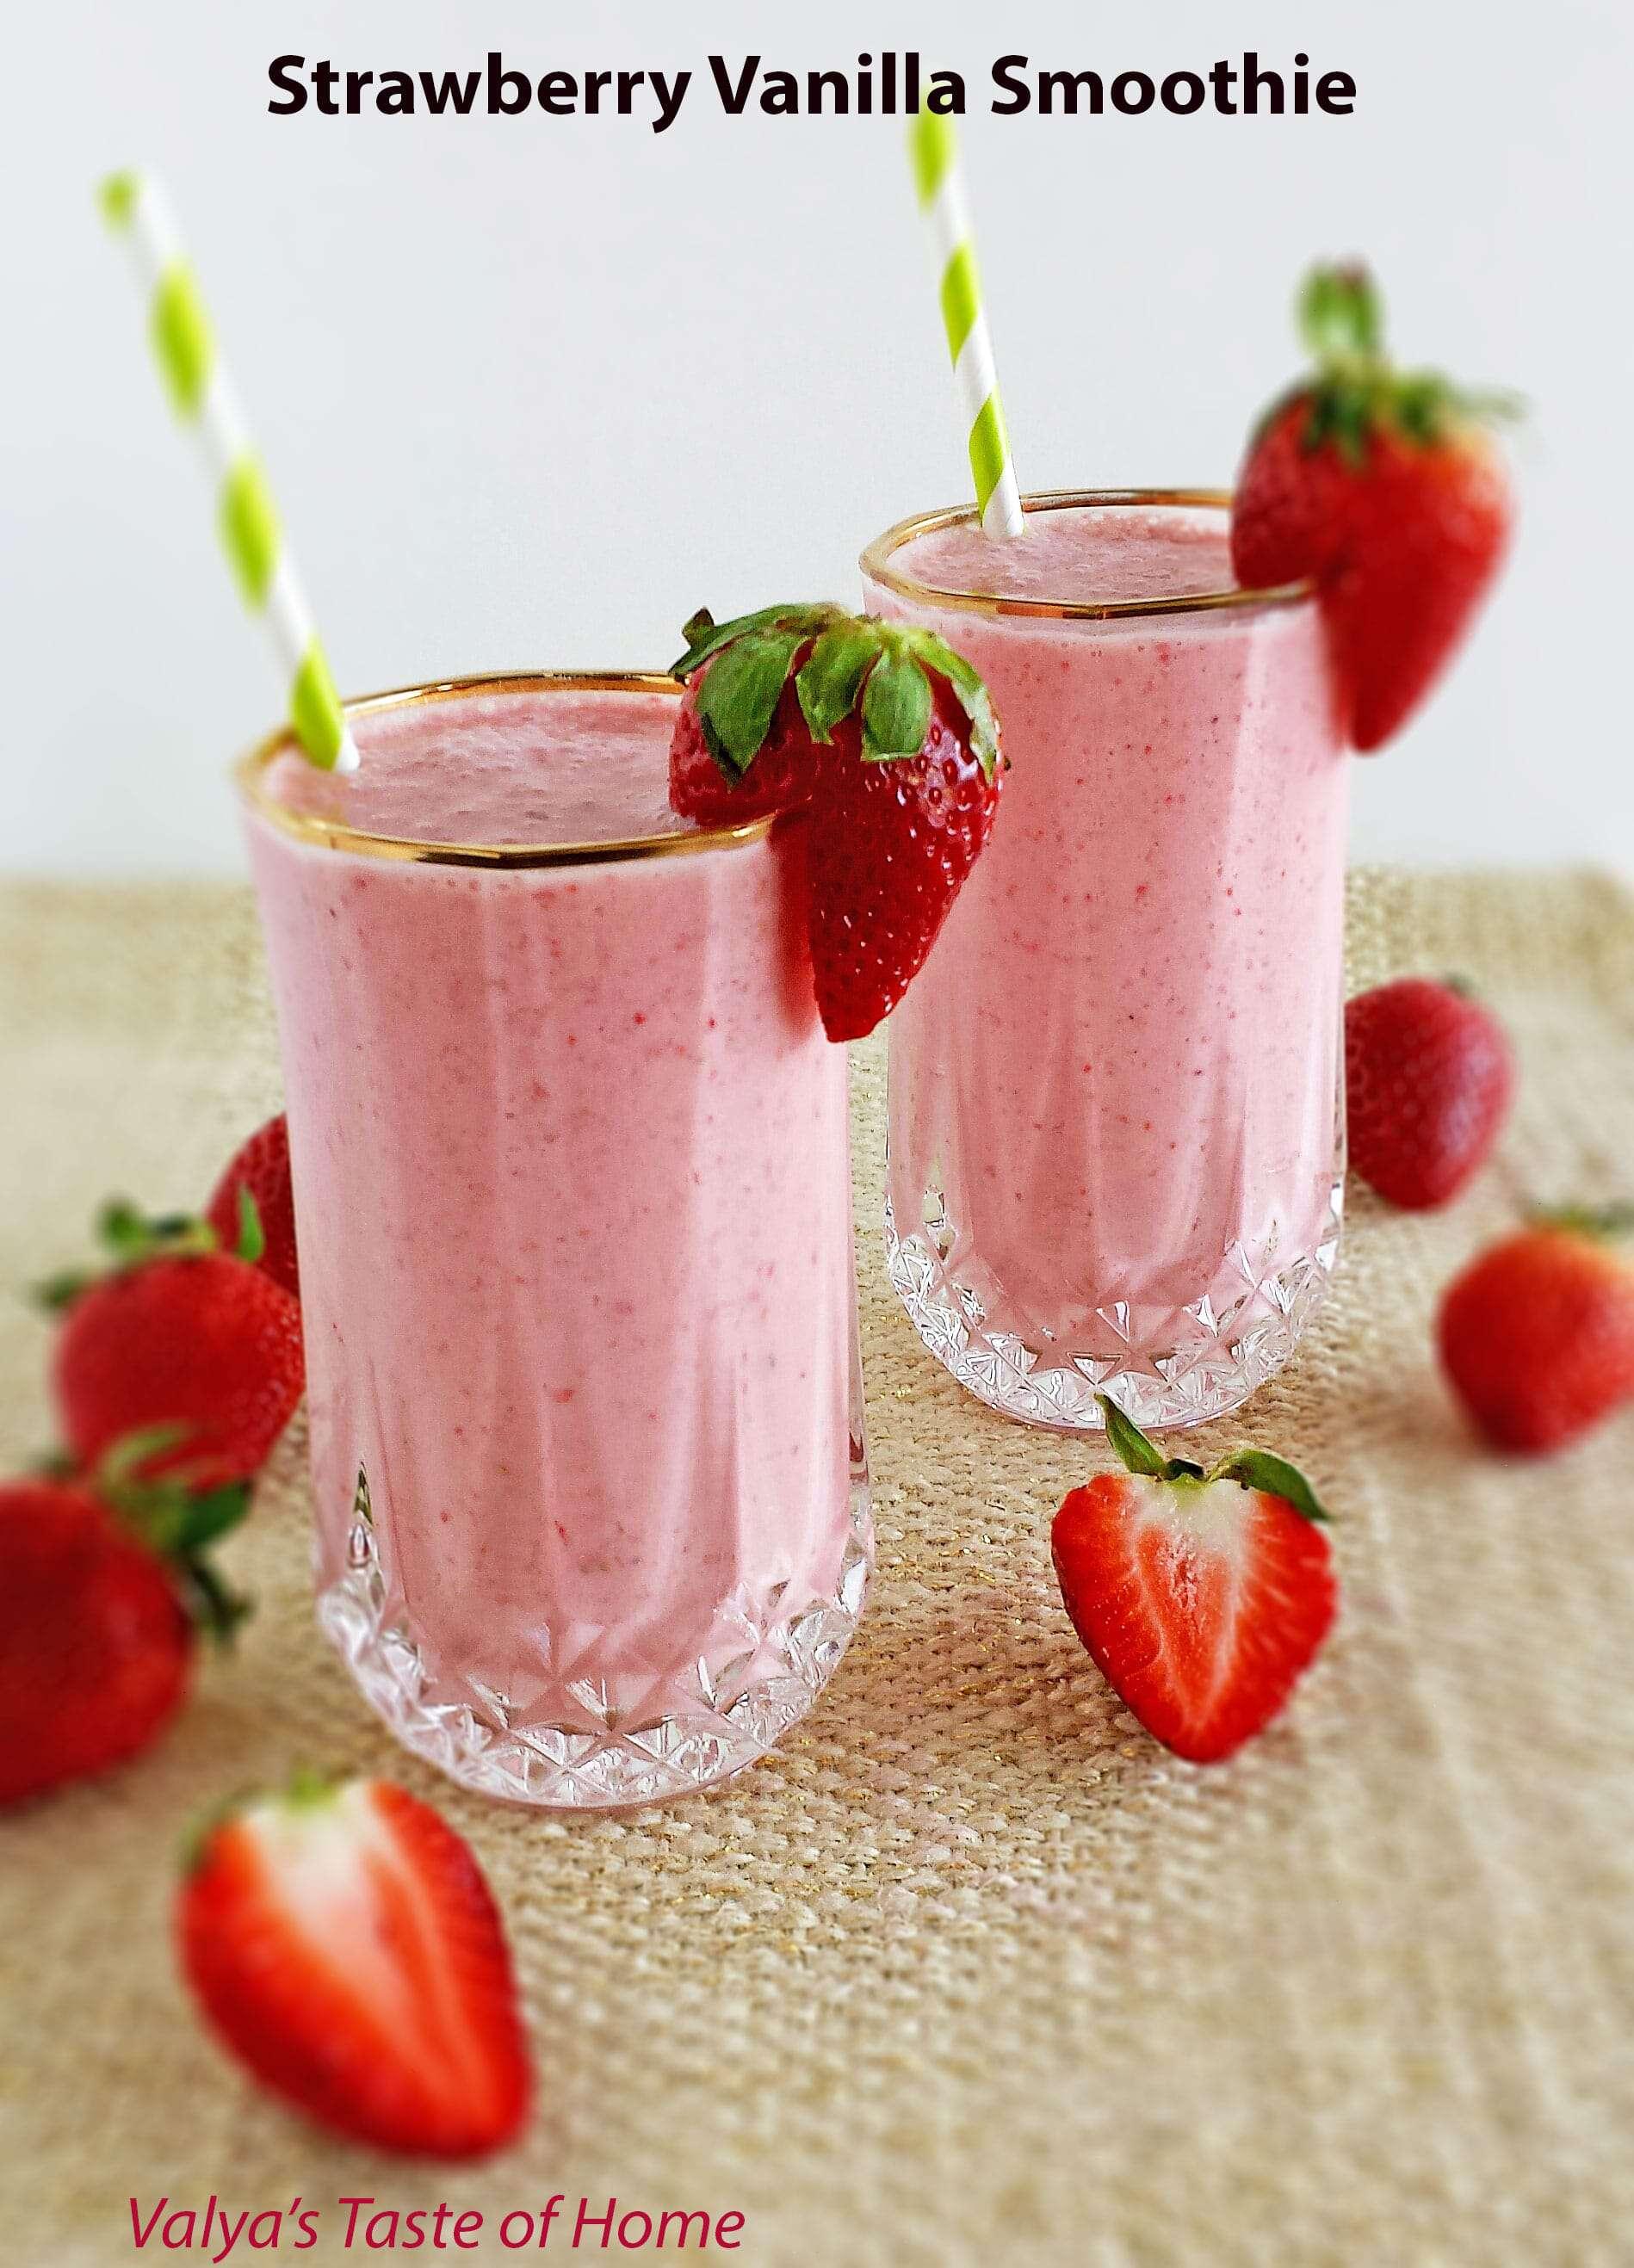 Strawberry Vanilla Smooth